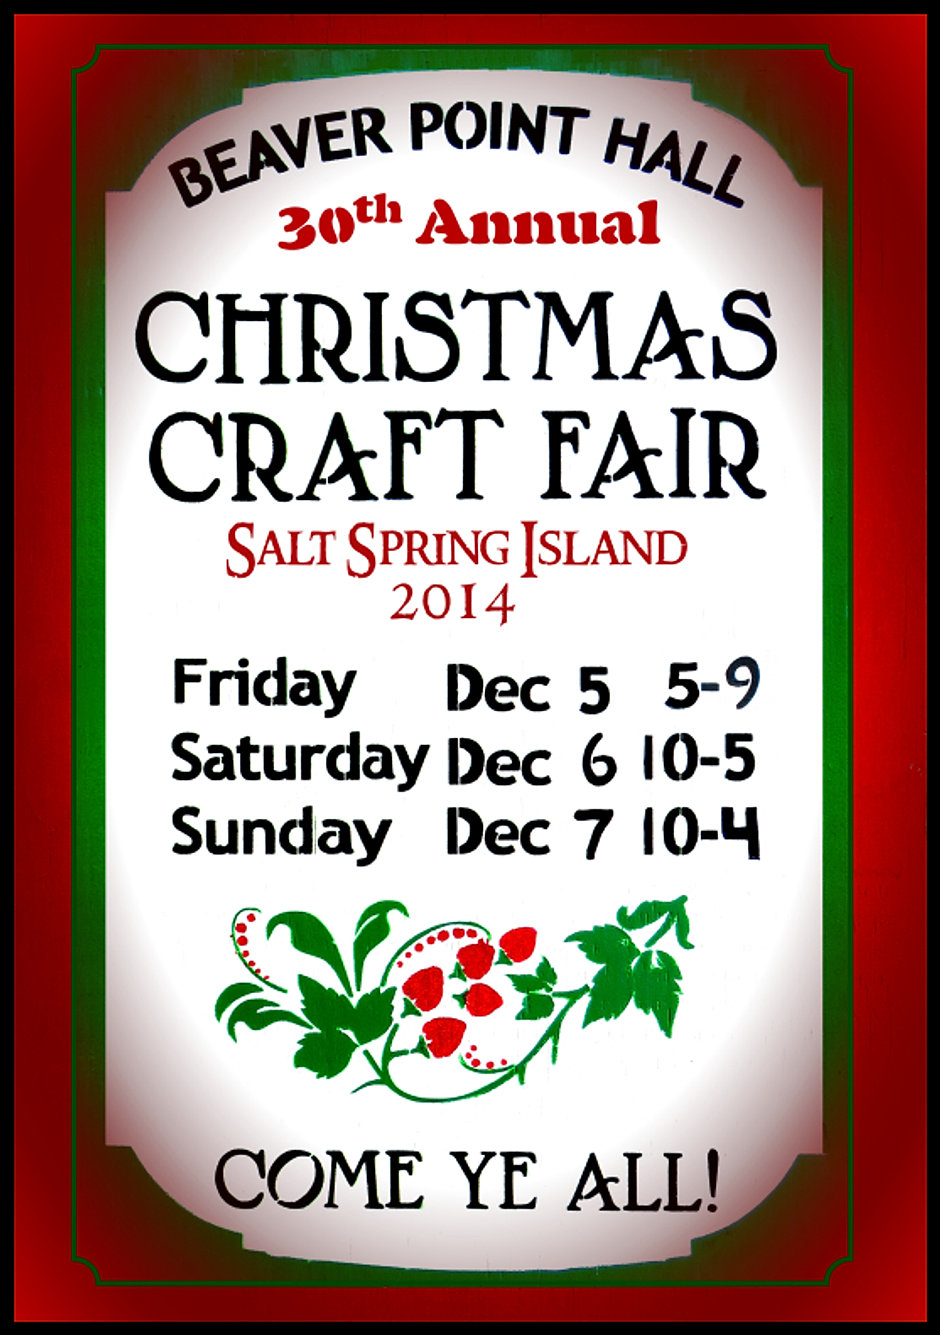 Clarkston Craft Fair